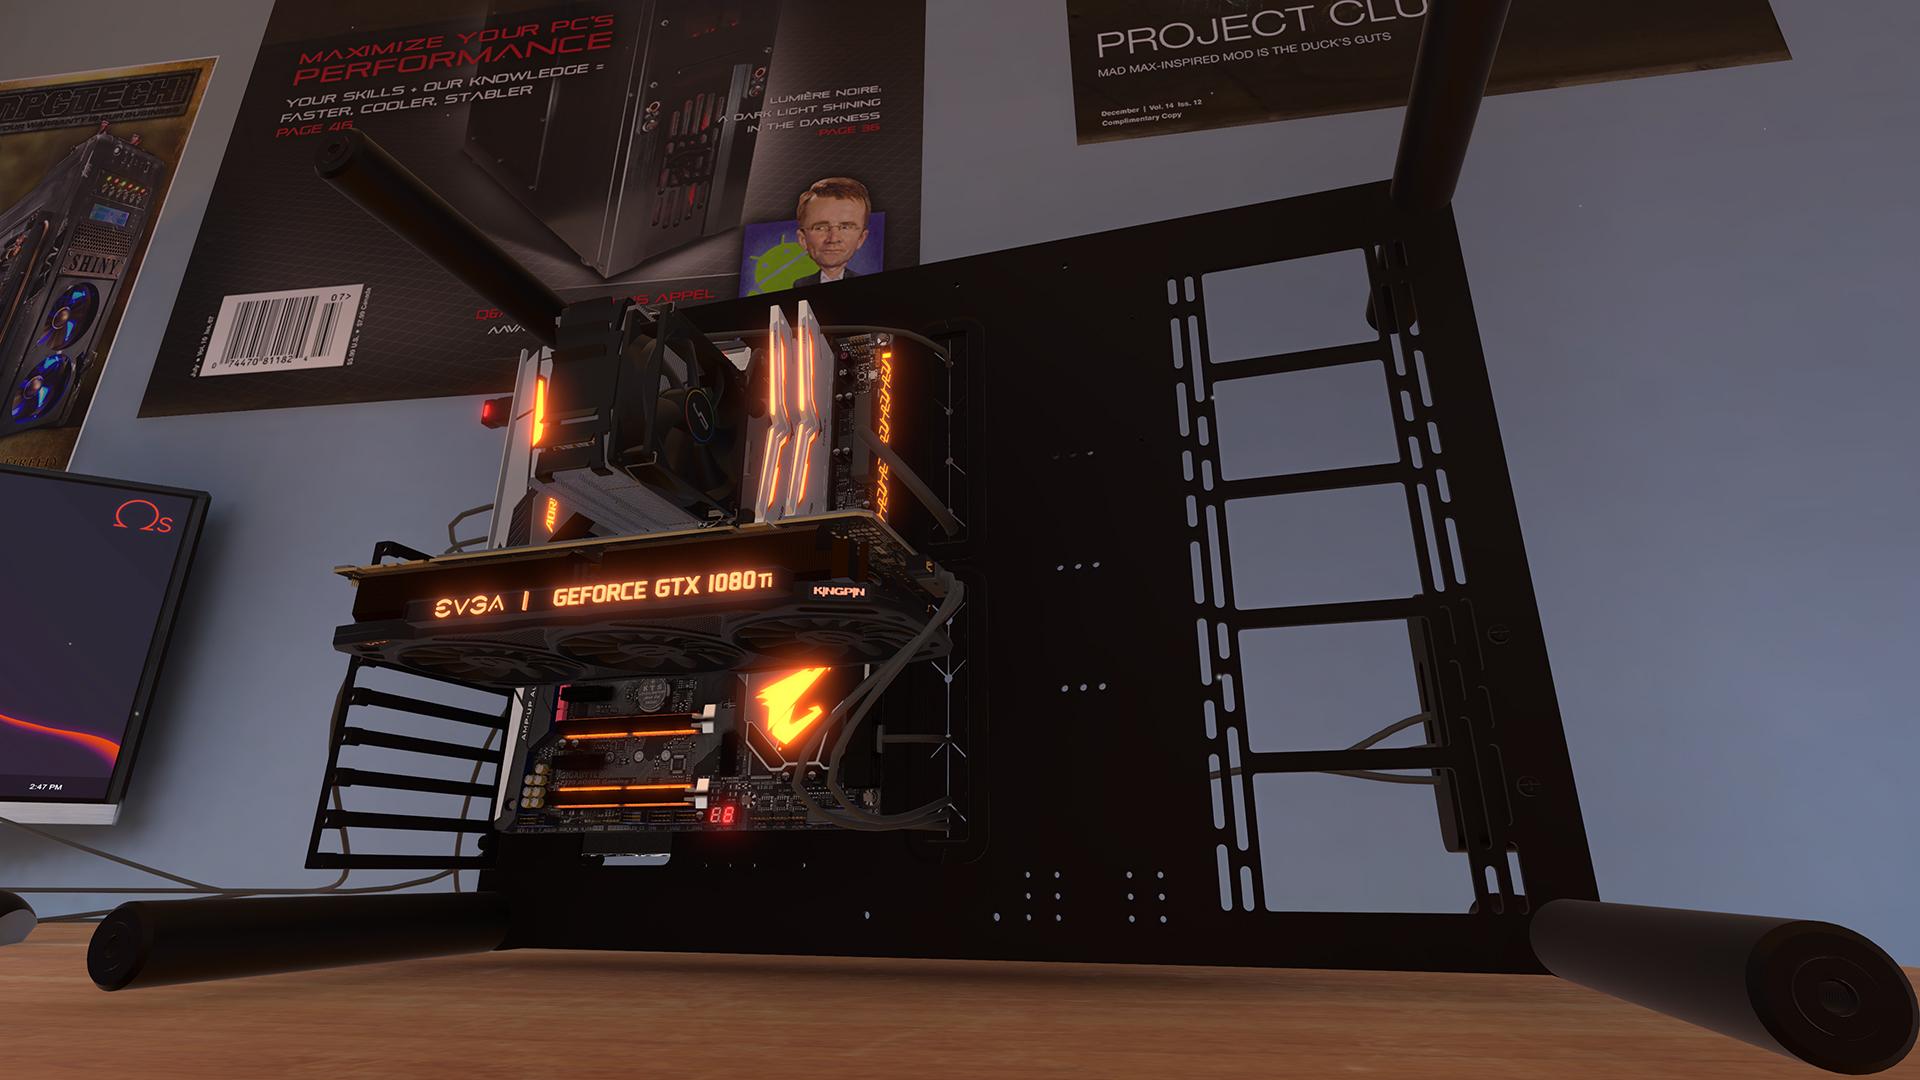 Contest: Win a Steam key for PC Building Simulator screenshot